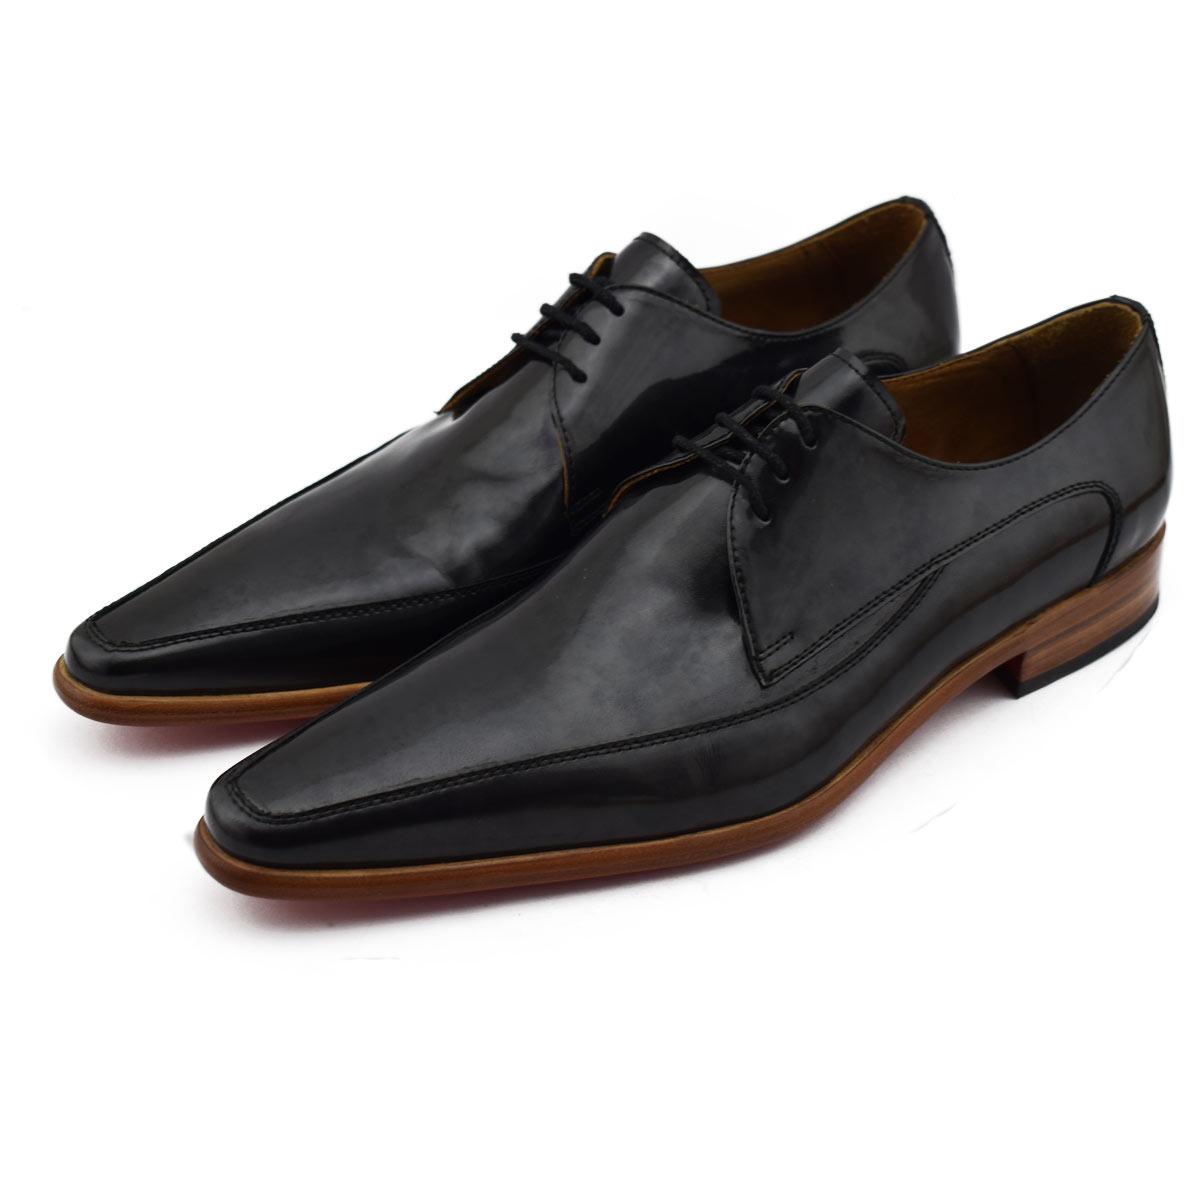 454884d78d6 zapatos-hombre-ofertas-sale-dino-butelli lightbox · lightbox